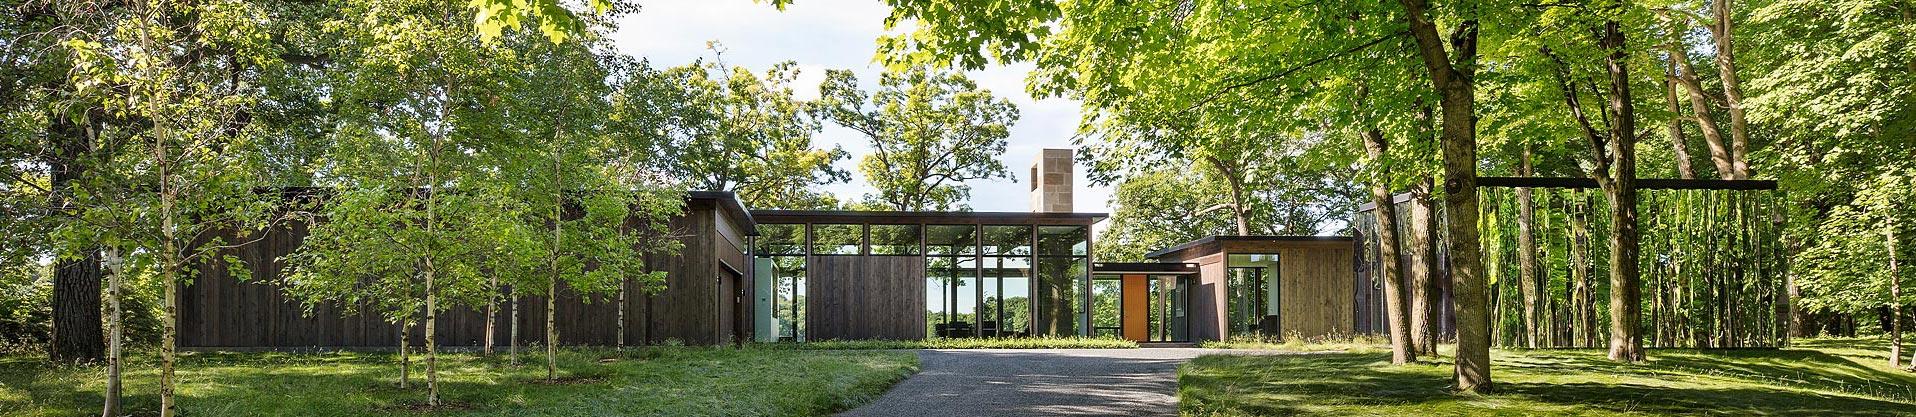 ALTUS-woodland-house-PC_030.jpg